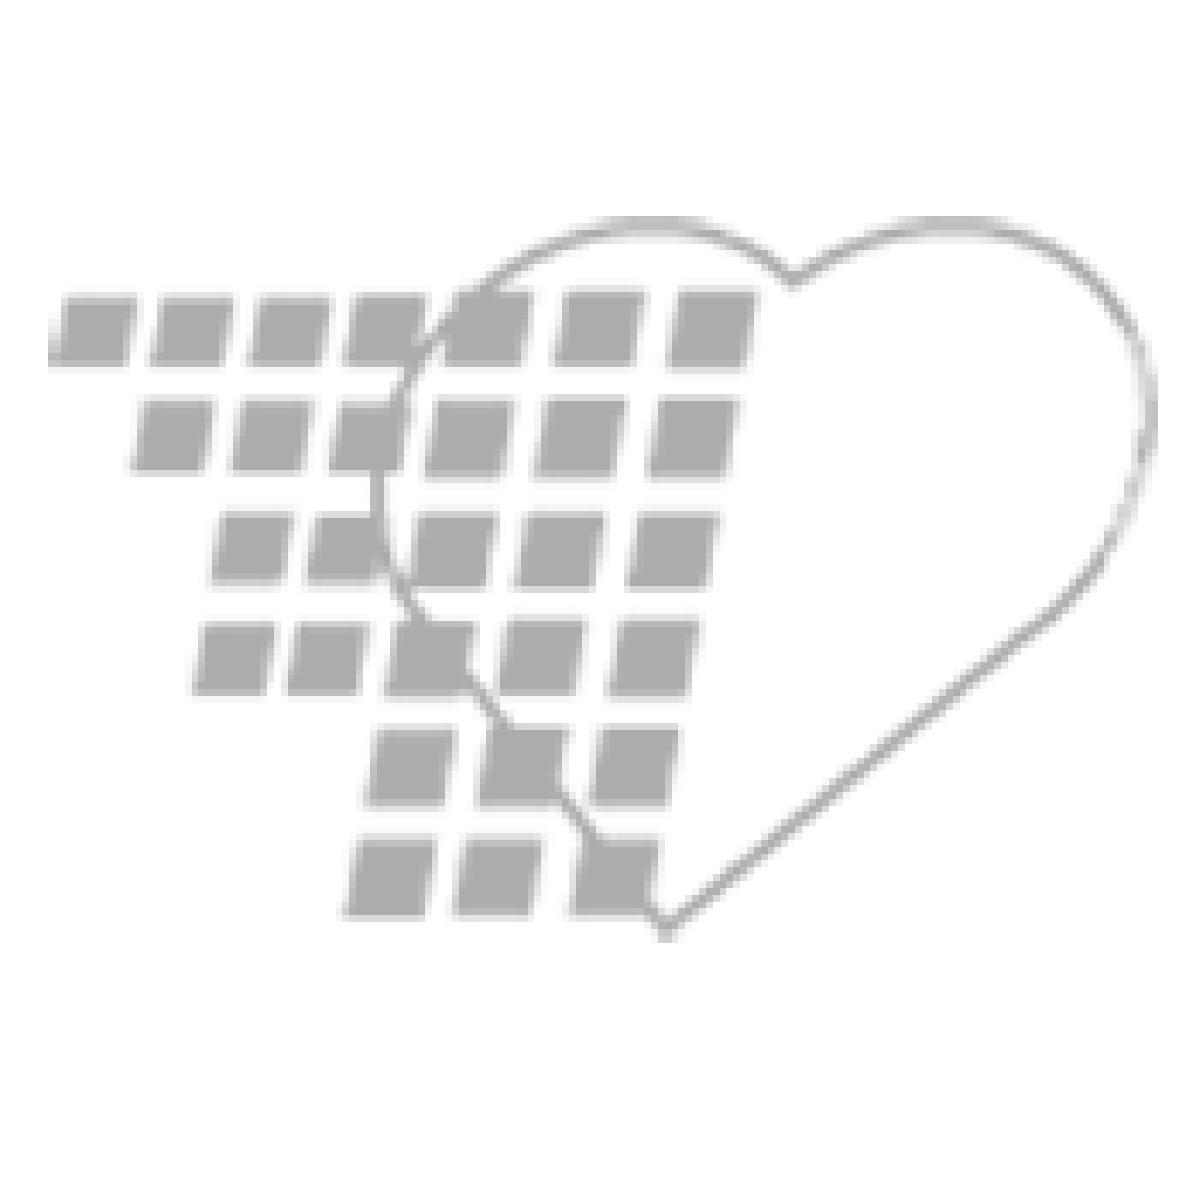 06-93-0315 - Demo Dose® Long Term Glucphag-XR 500 mg Medication Pack